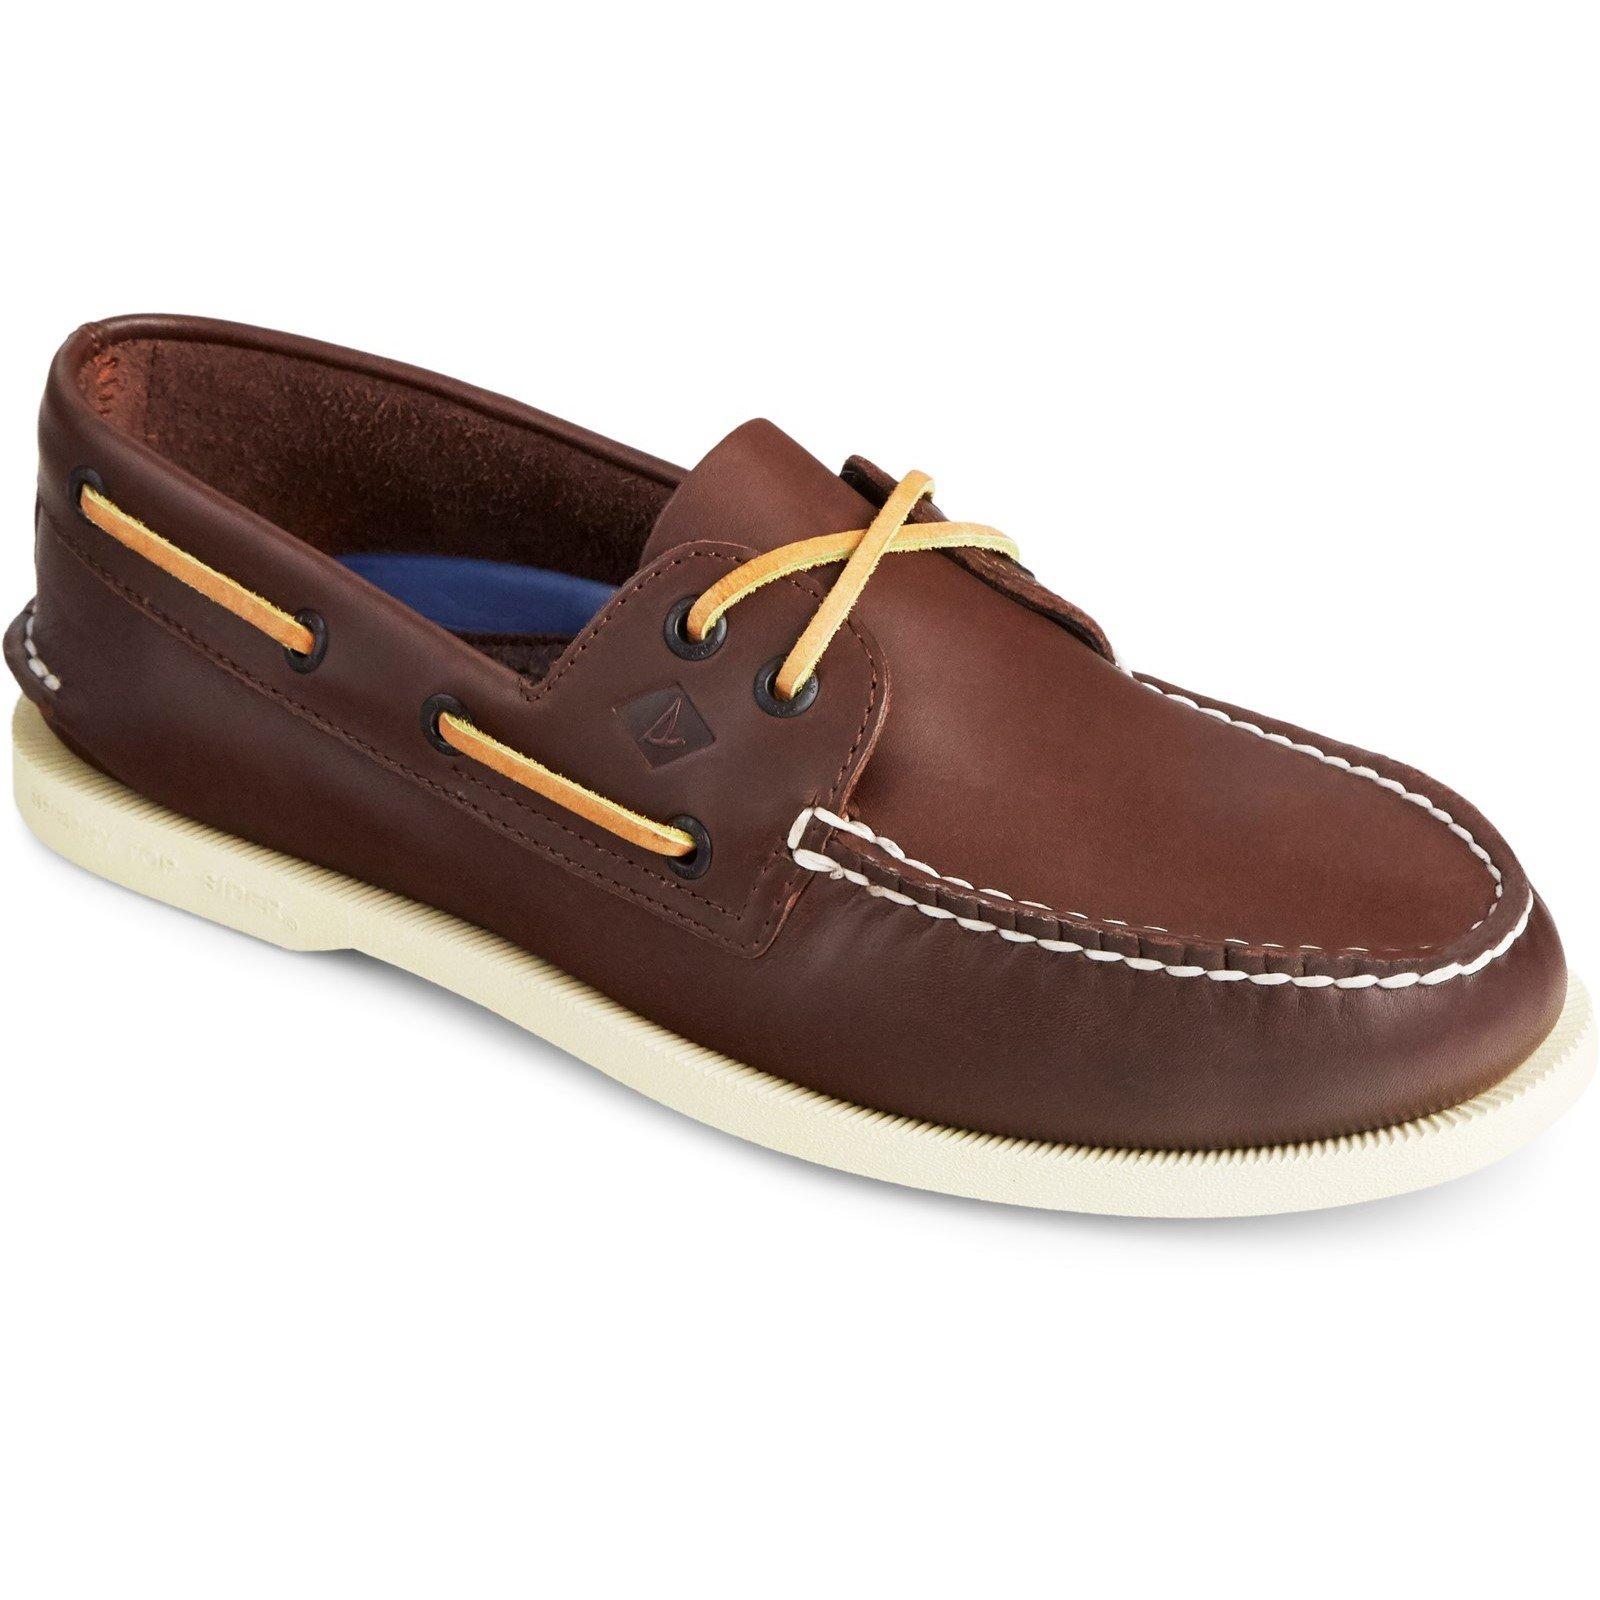 Sperry Men's Authentic Original Leather Boat Shoe Various Colours 31524 - Brown 7